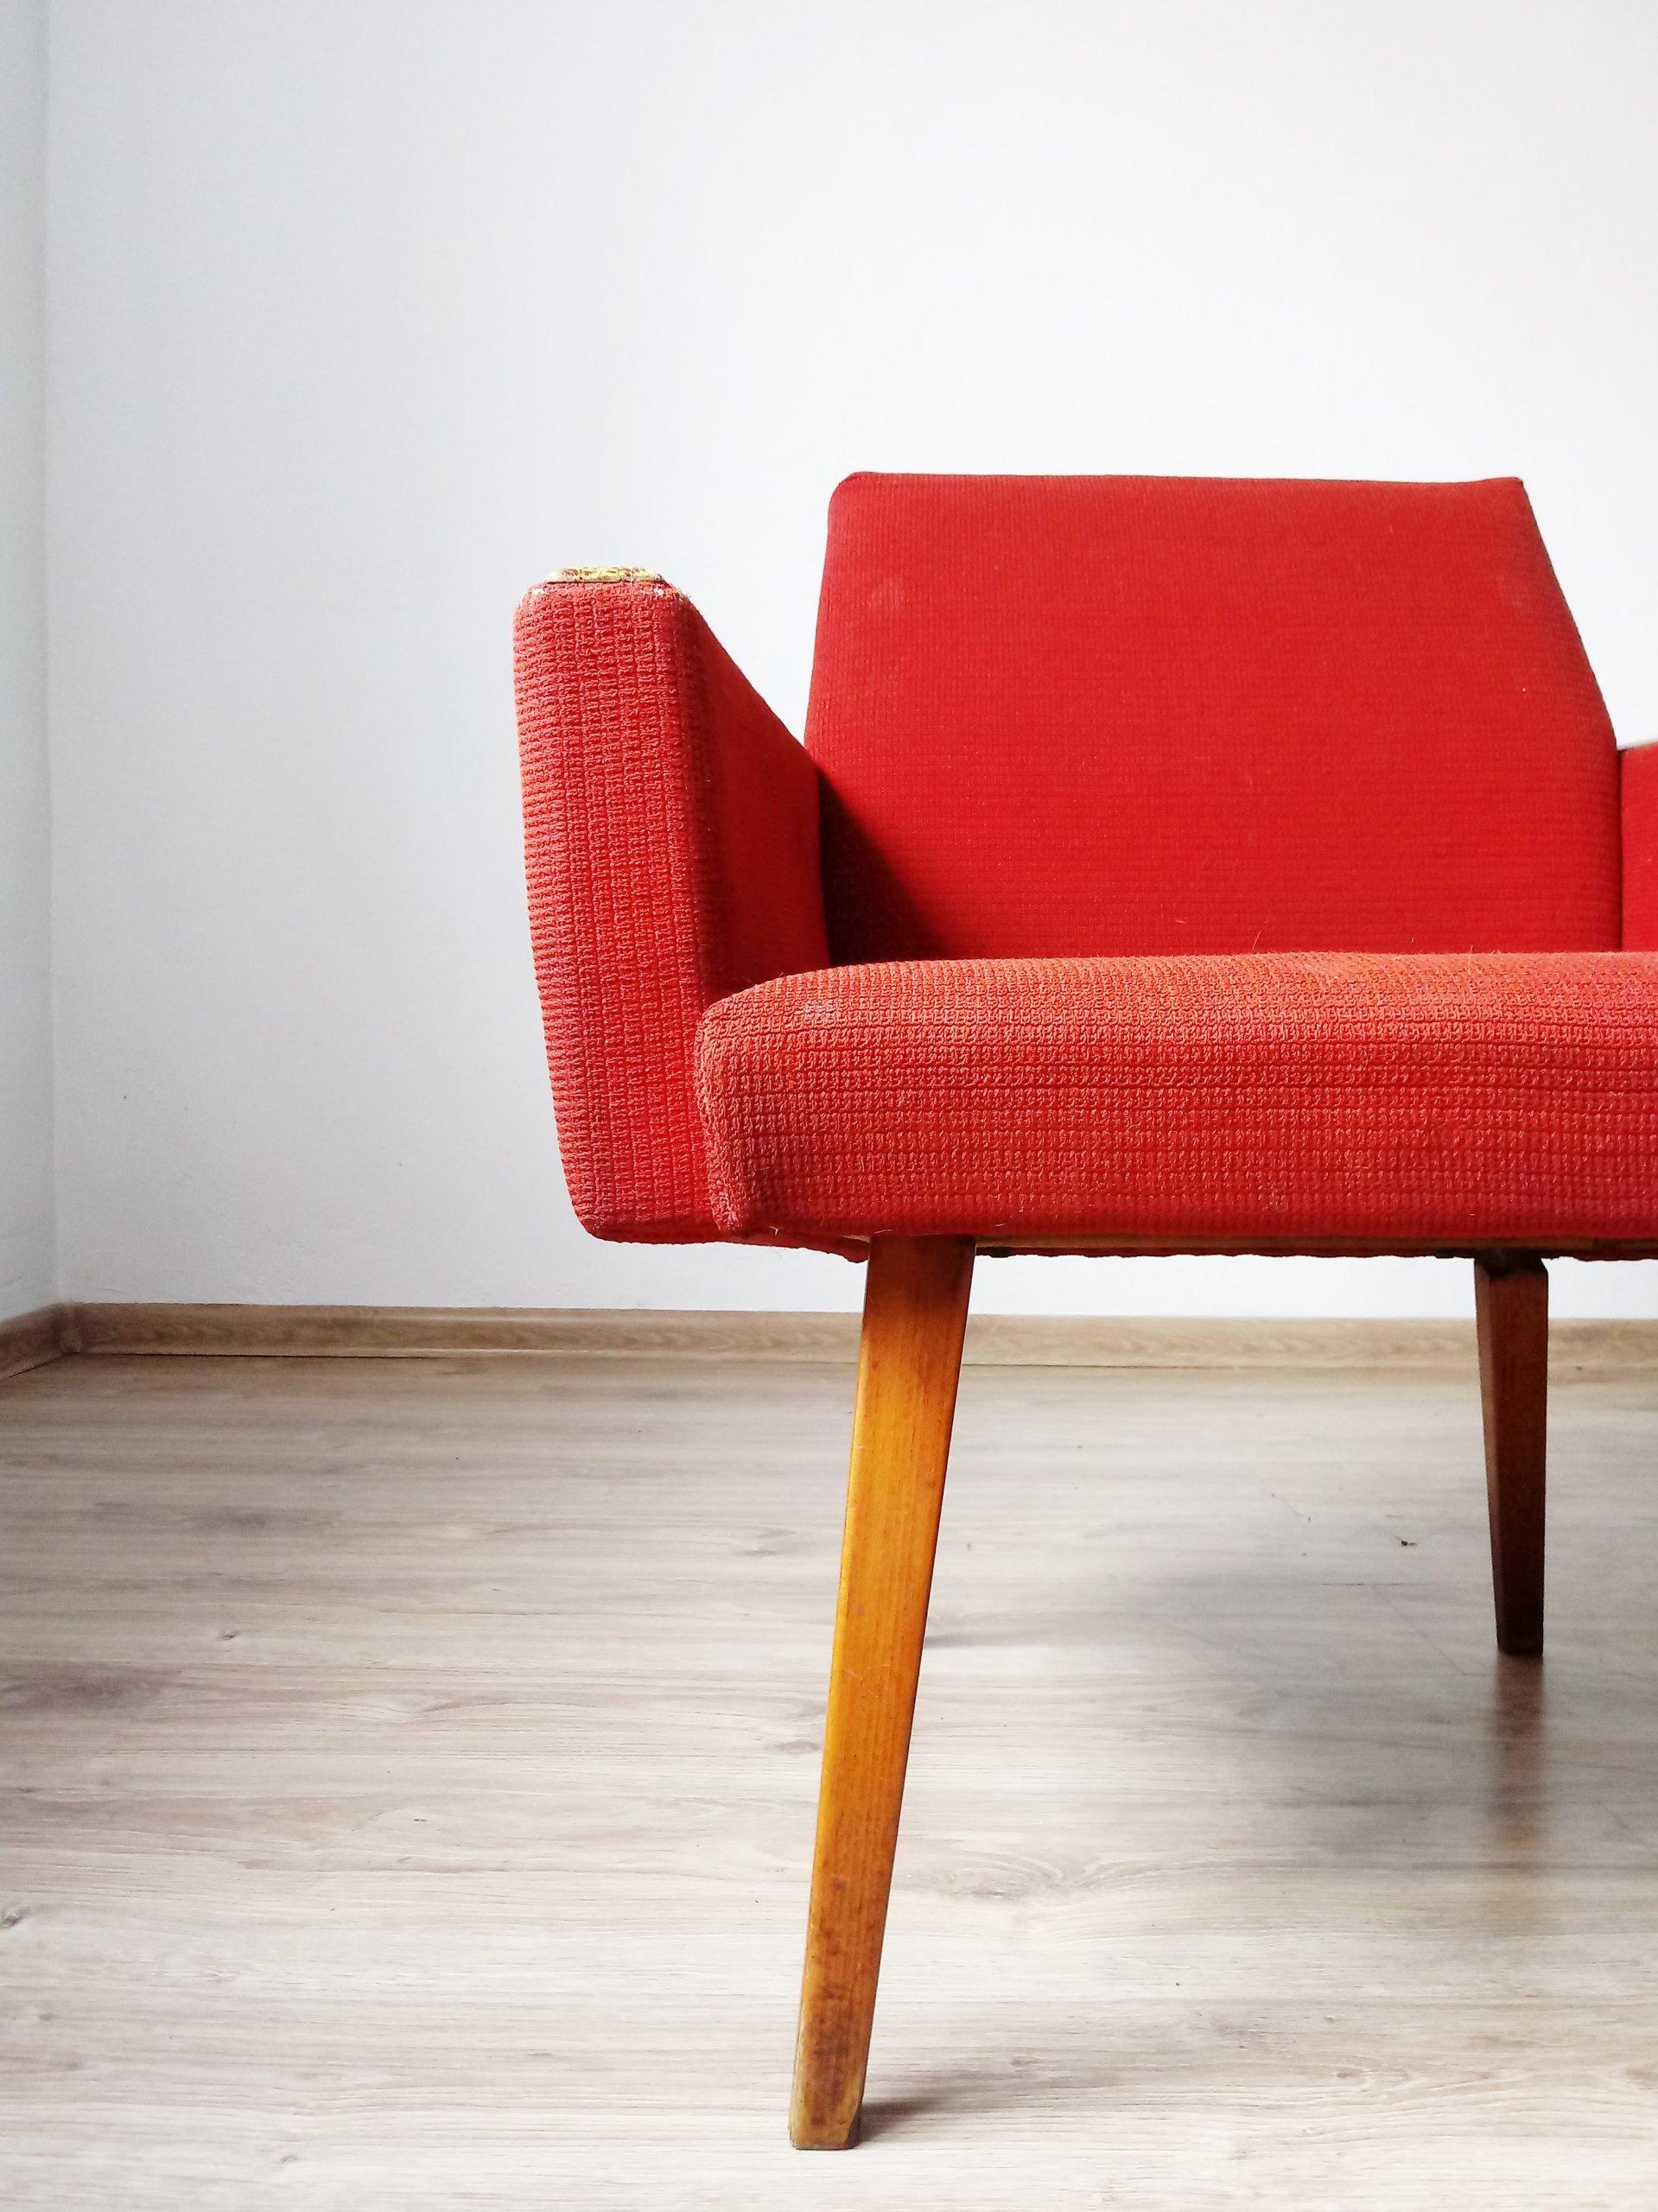 Retro Fotele Lata 60 Czasy Prl 7265200877 Oficjalne